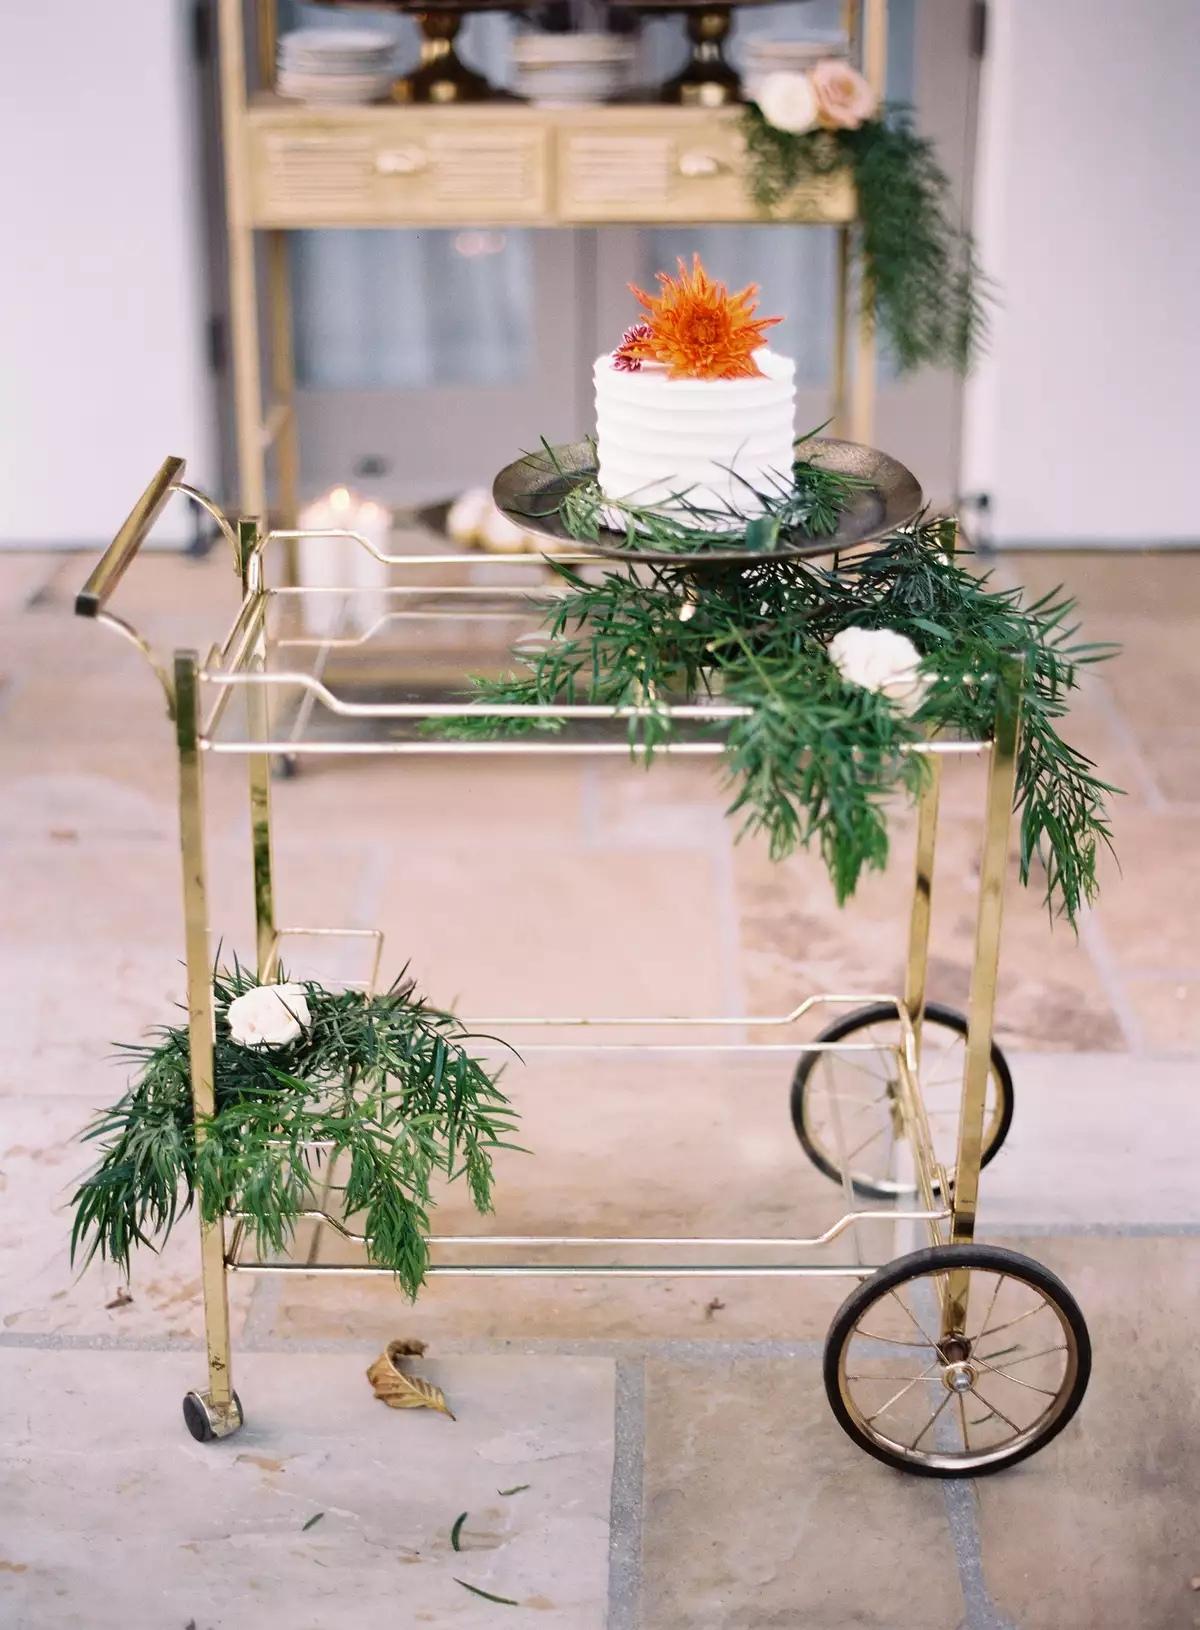 Wc8g zwcVxA - Маленькие свадебные торты